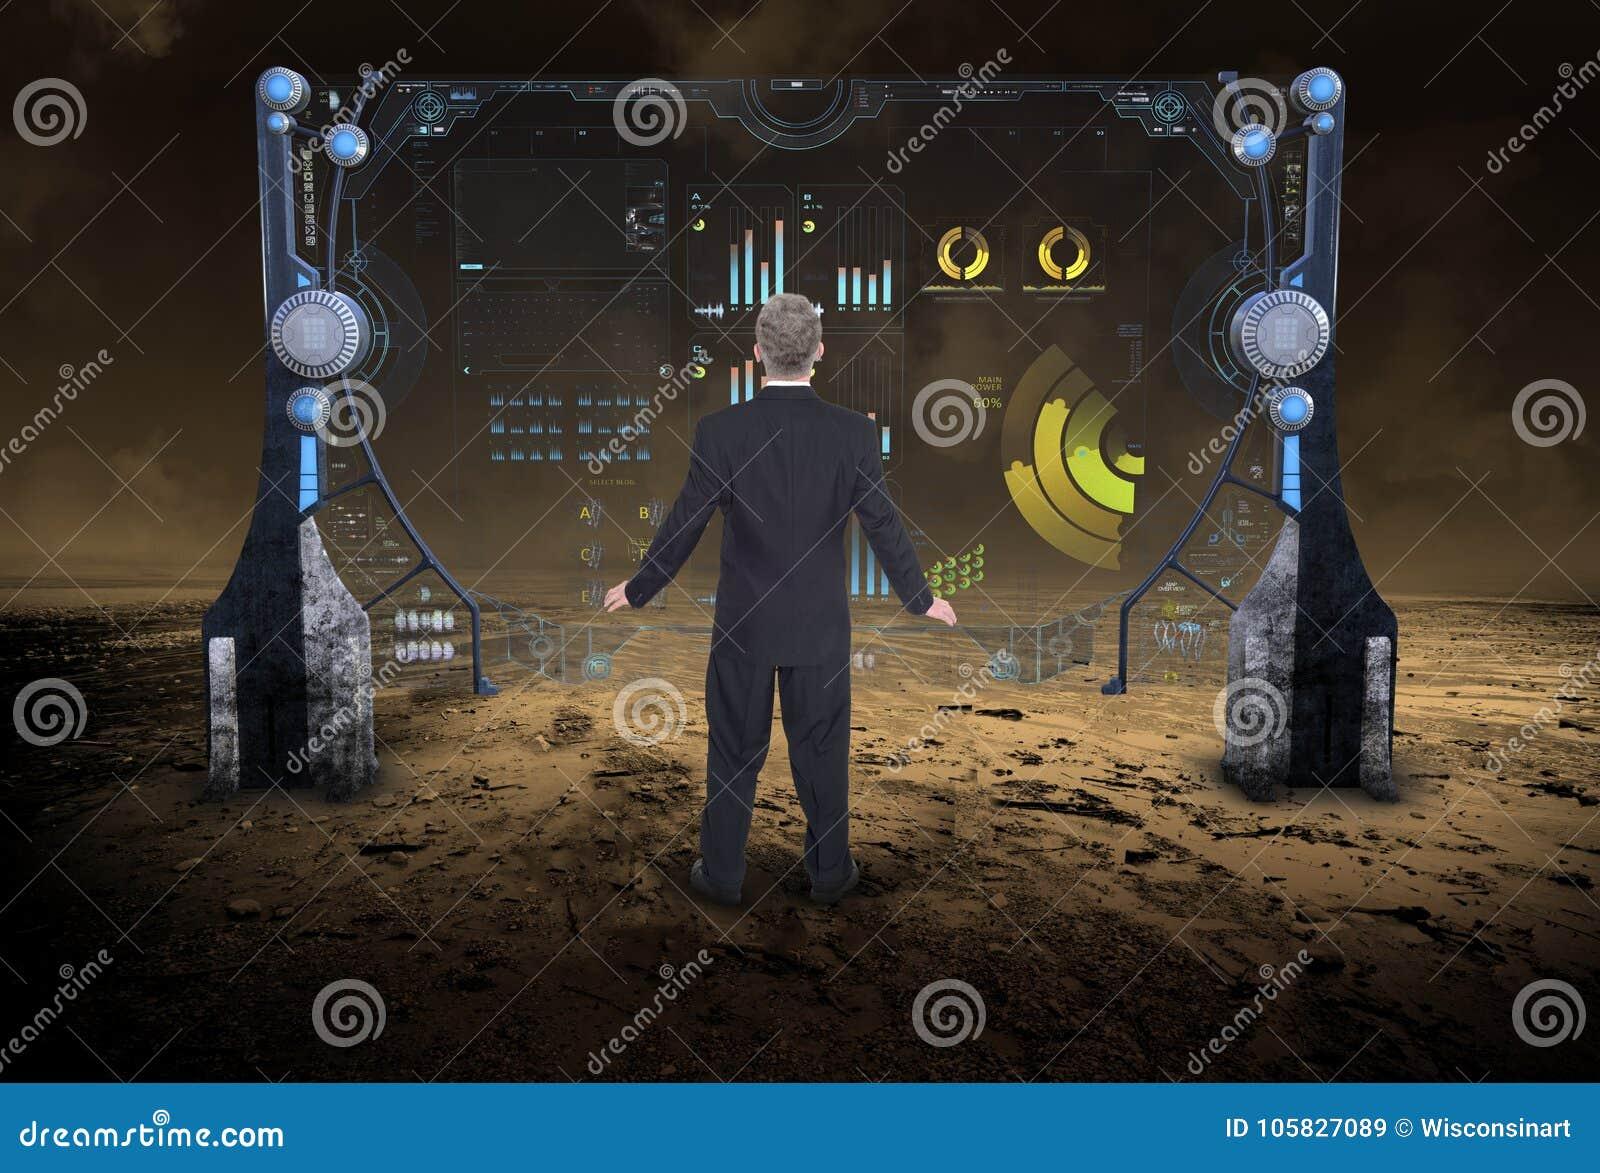 Informatietechnologie, Gegevens, Zaken, Science fiction